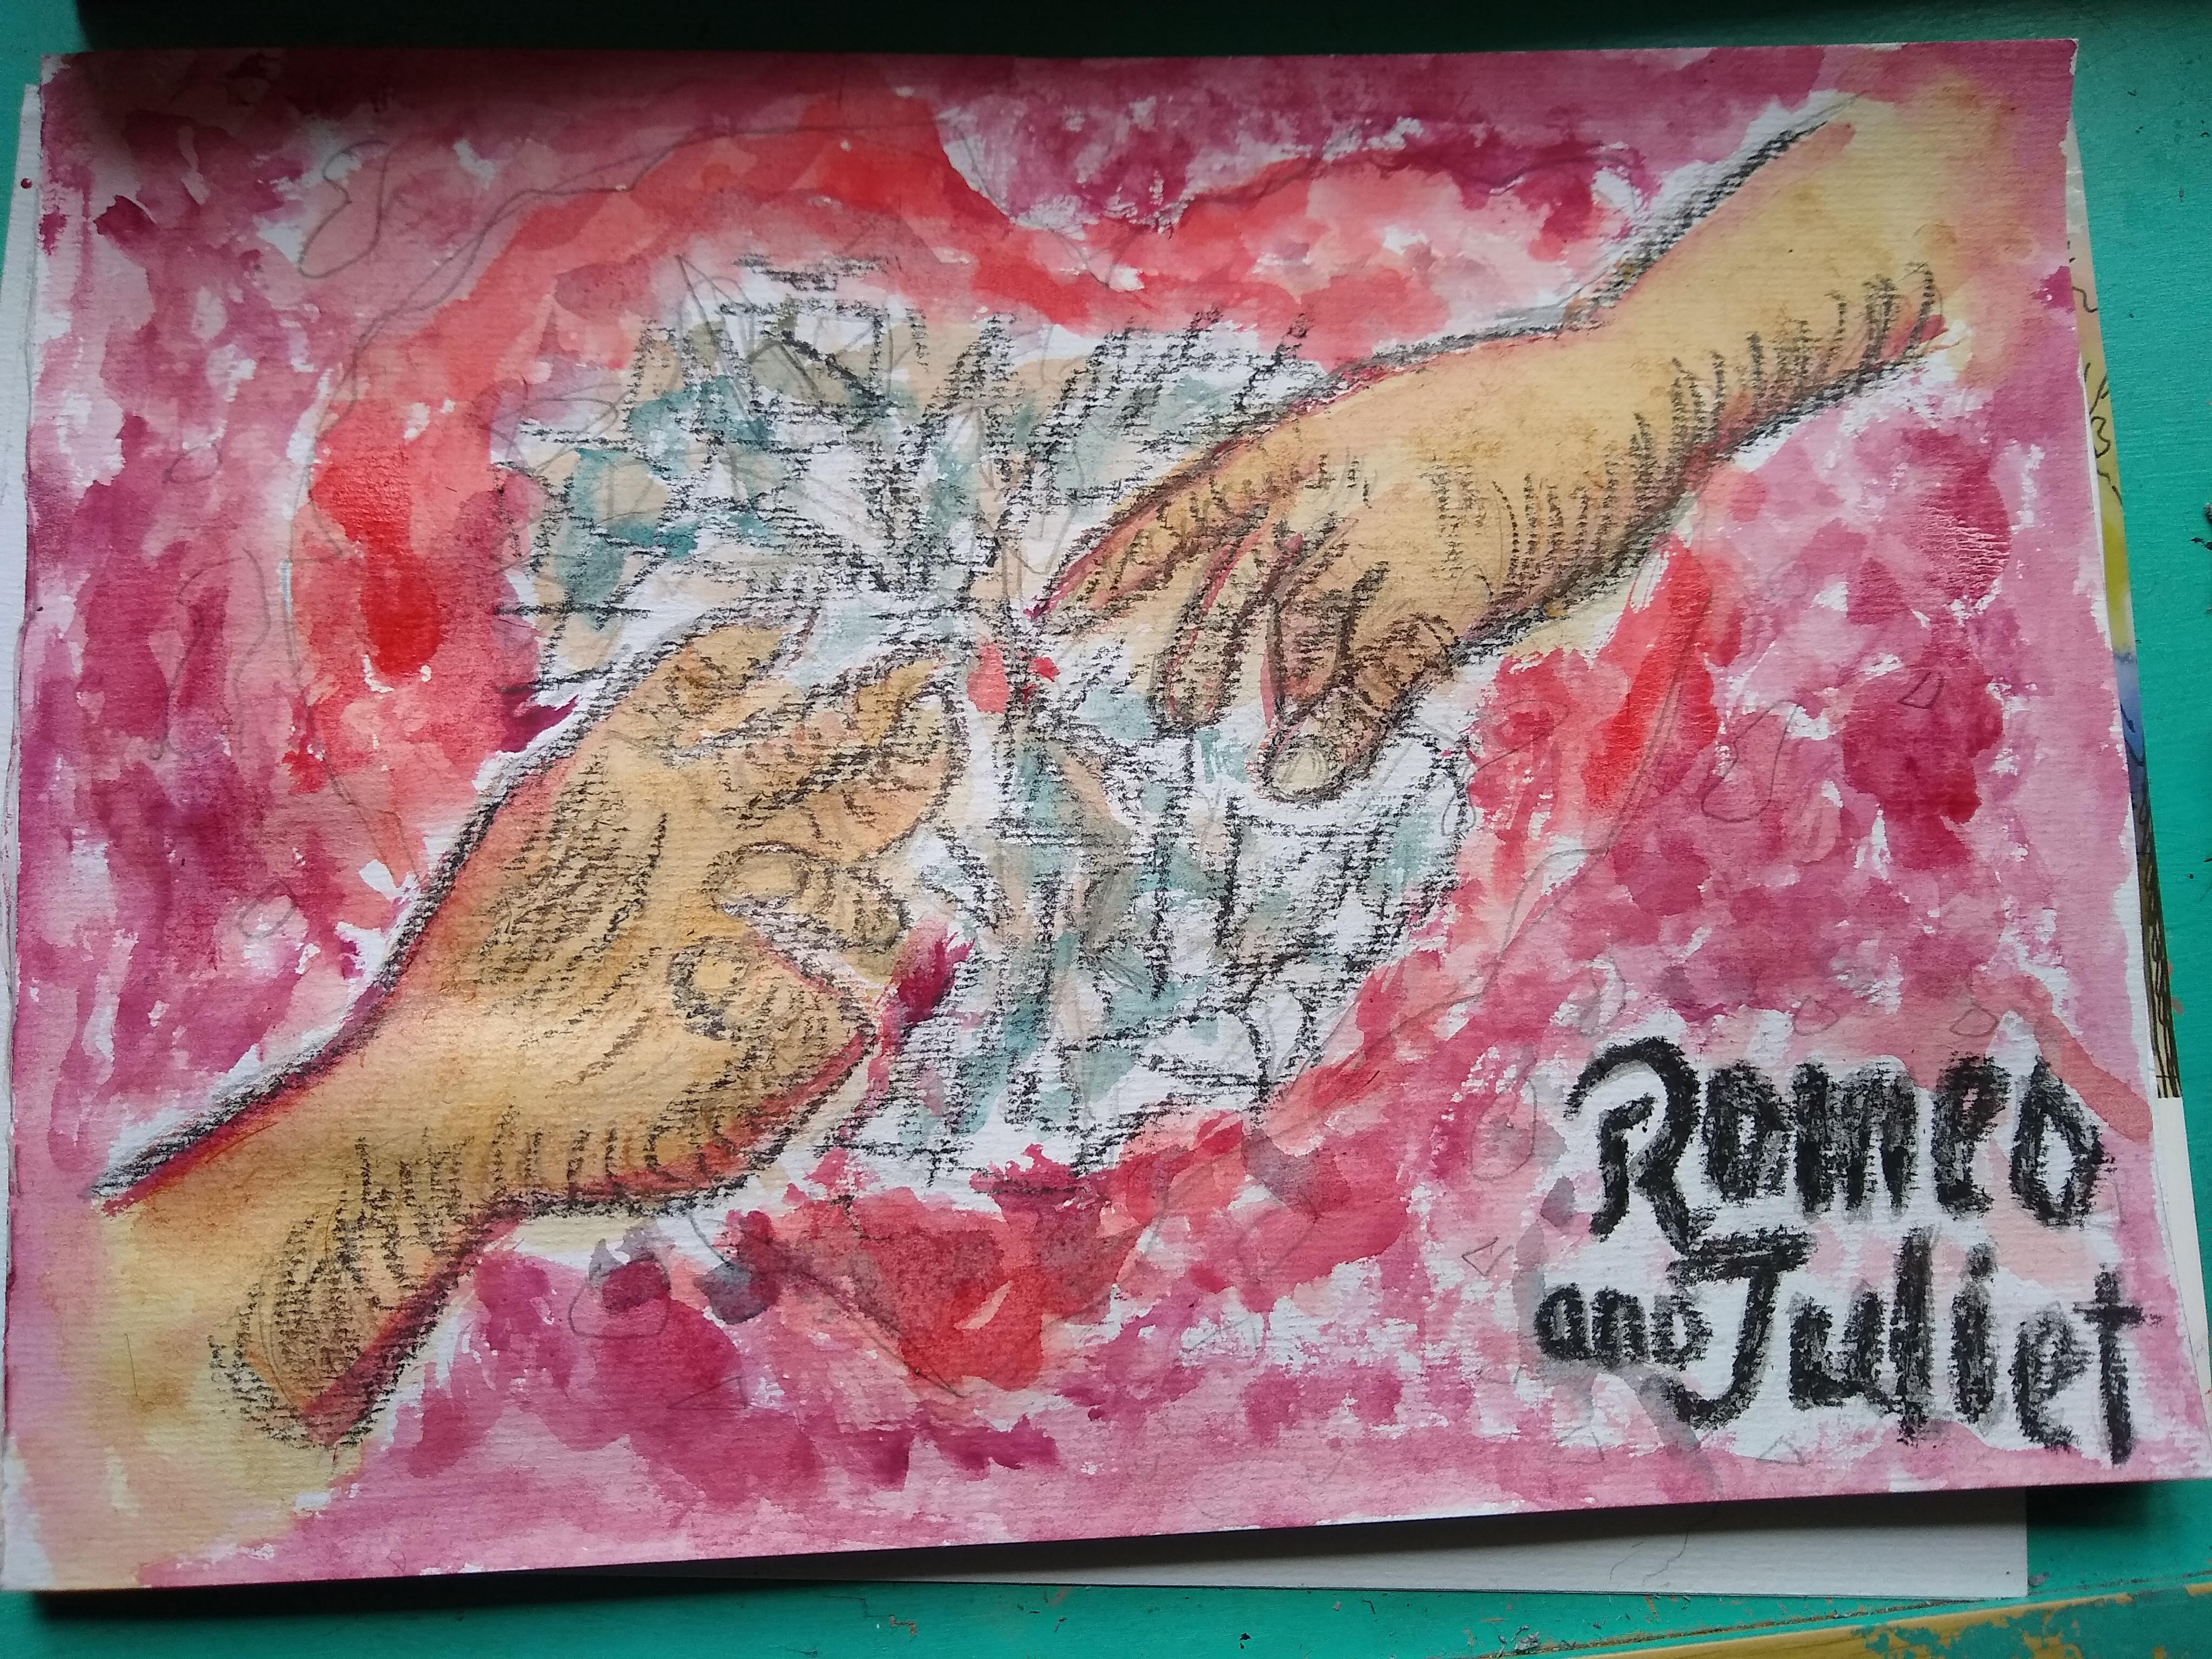 15/06/20 - Romeo and Juliet